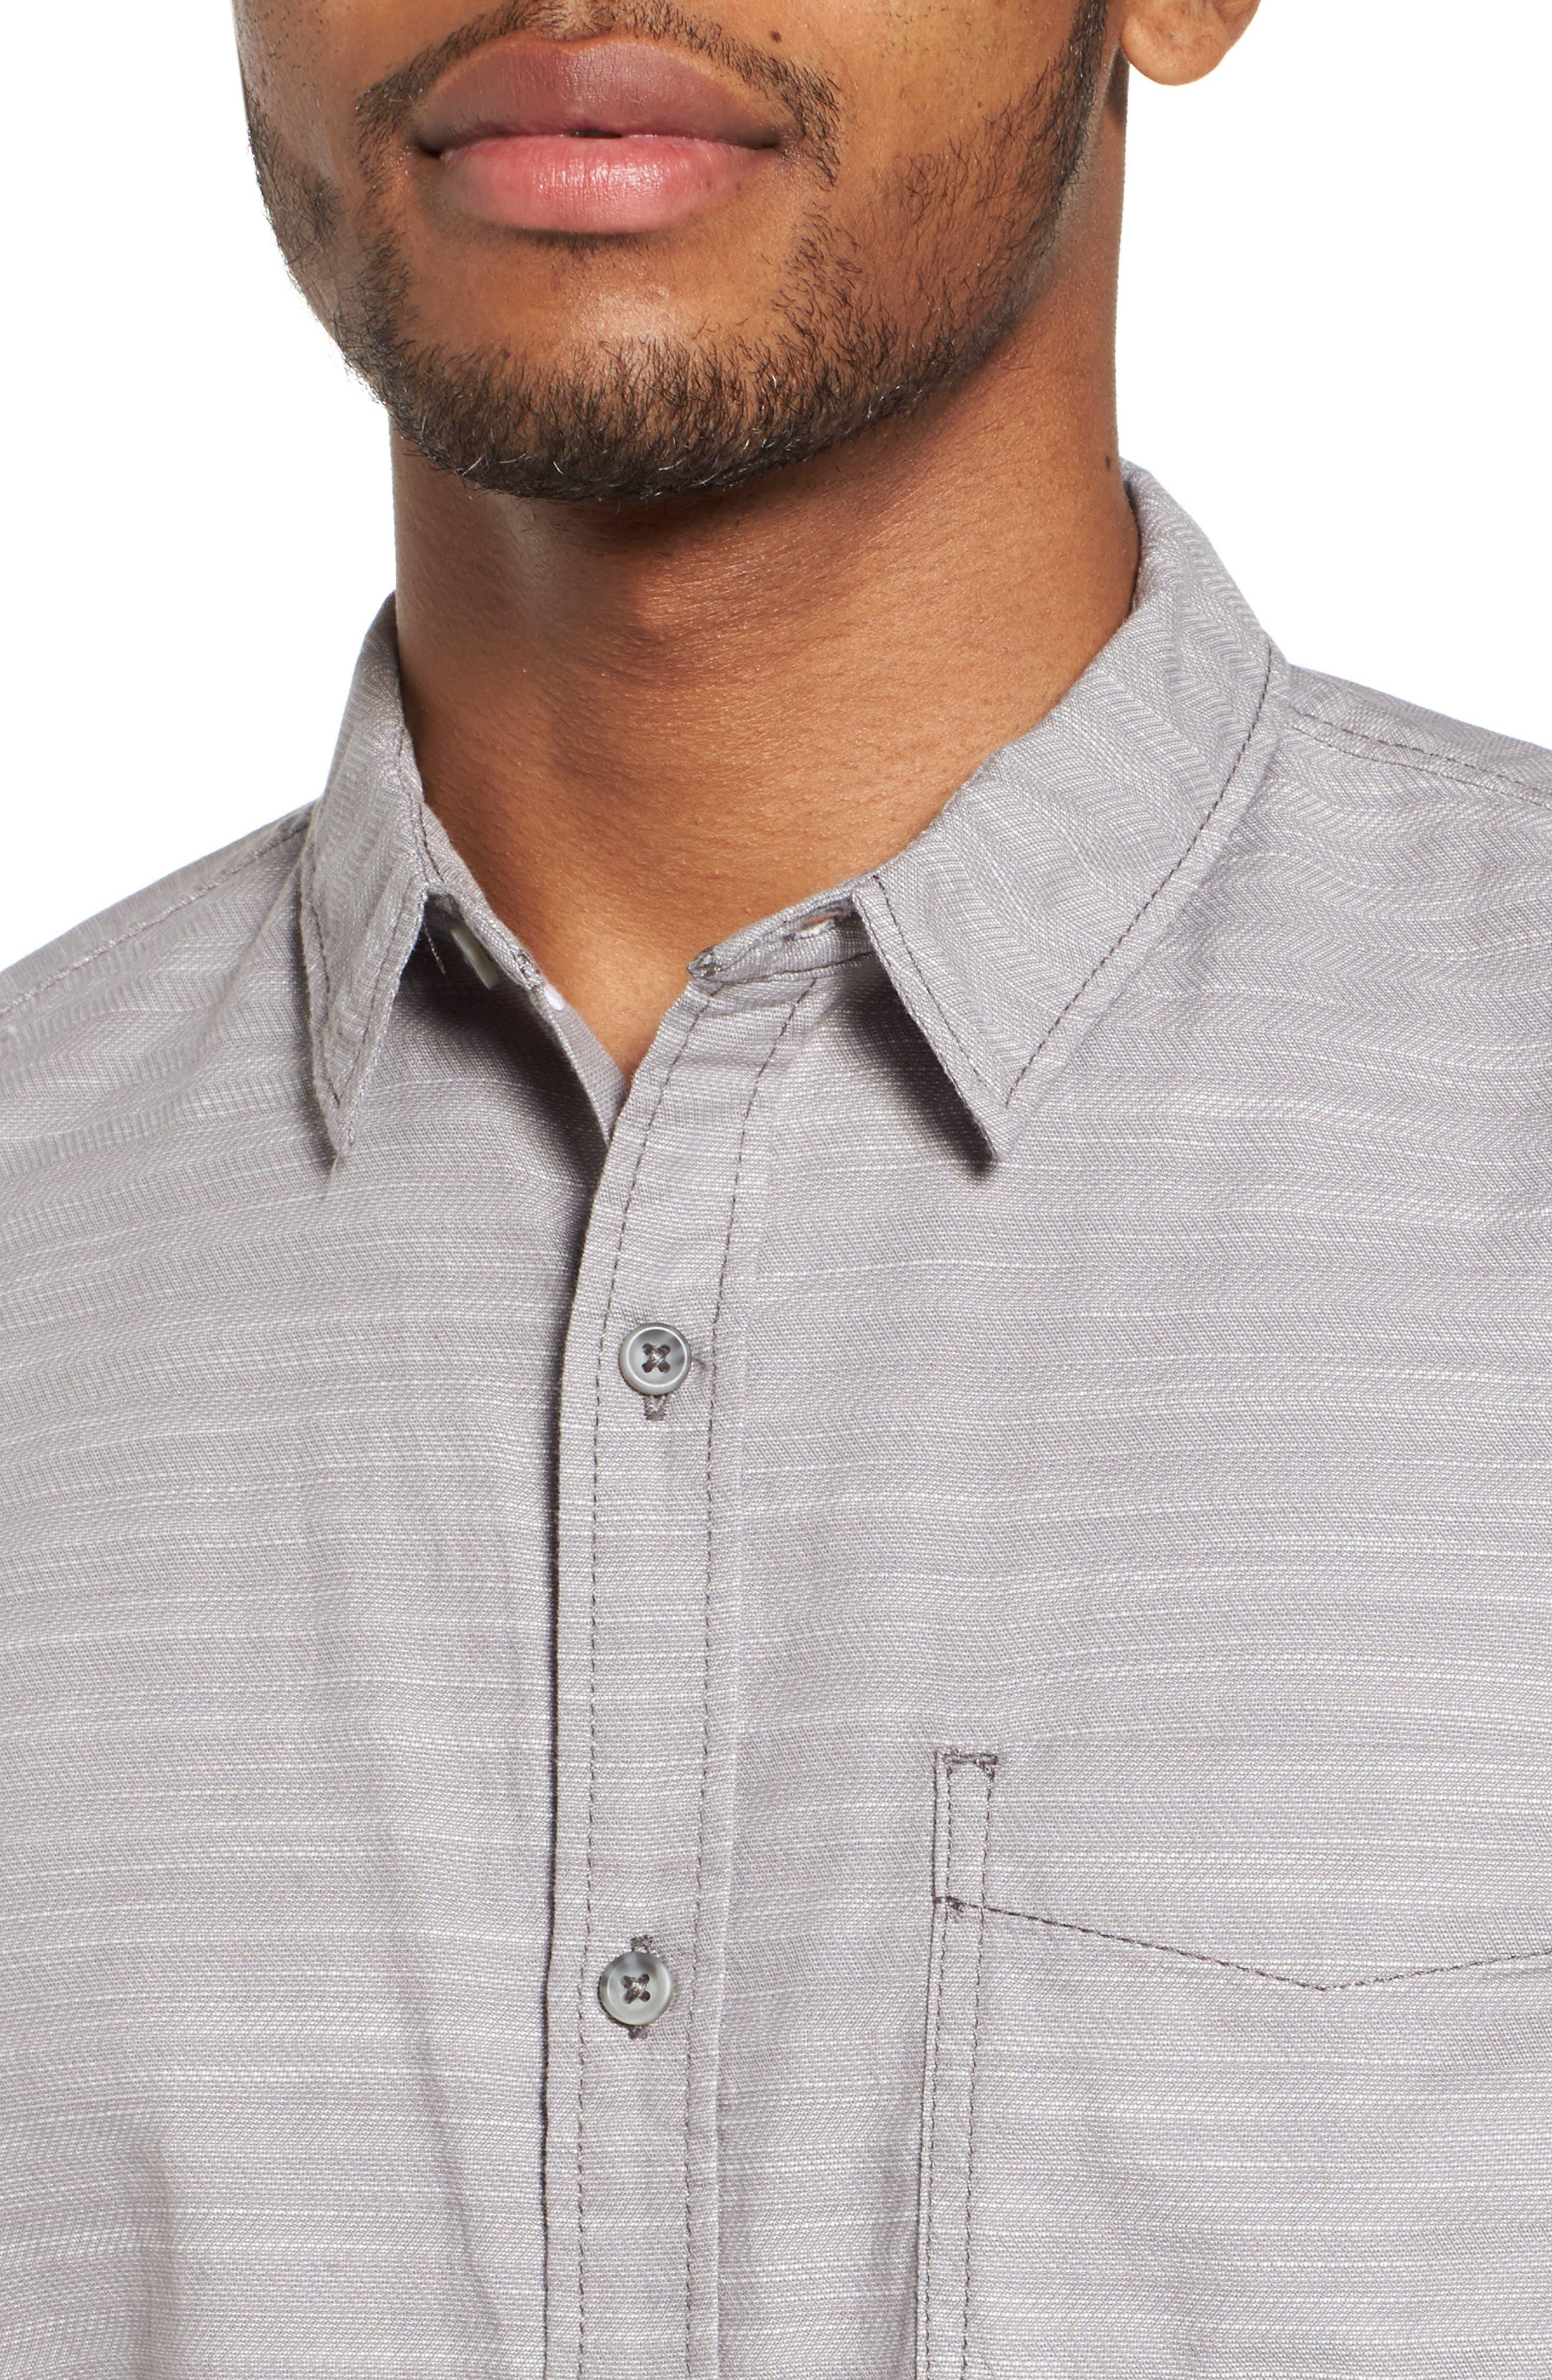 Herringbone Chambray Shirt,                             Alternate thumbnail 4, color,                             Grey Filigree Herringbone